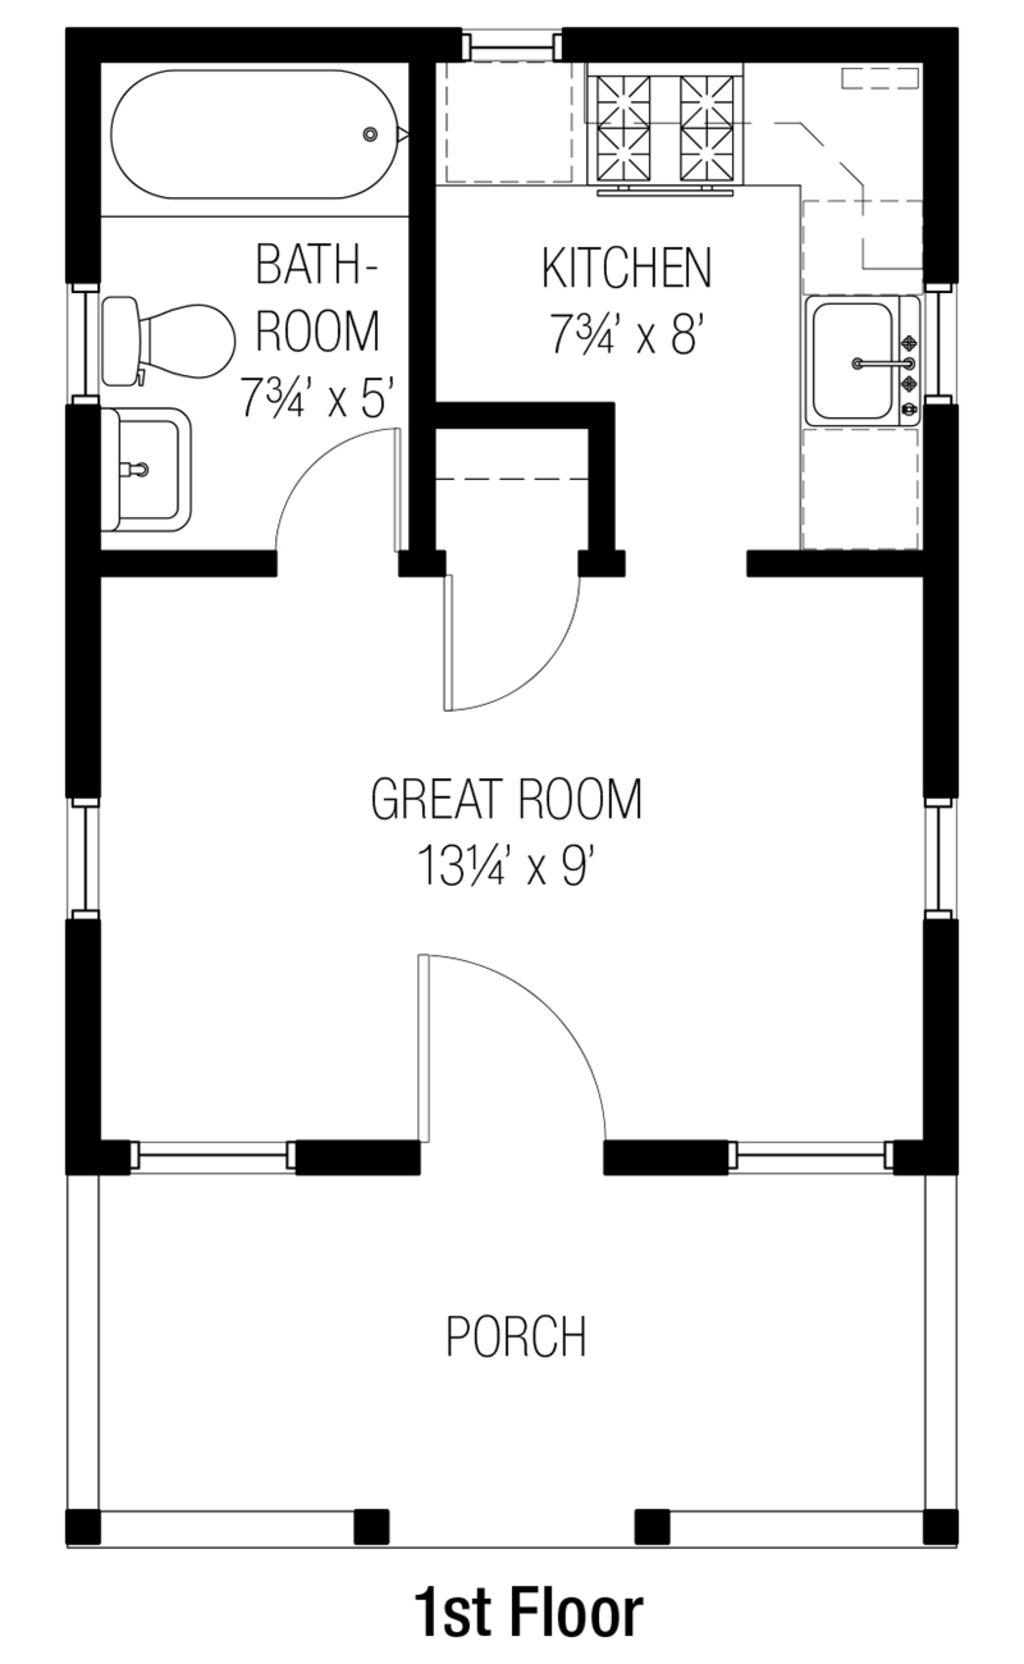 bungalow style house plan 1 beds 1 baths 261 sqft plan 915 - 9 Sq Ft Tiny House Floor Plans